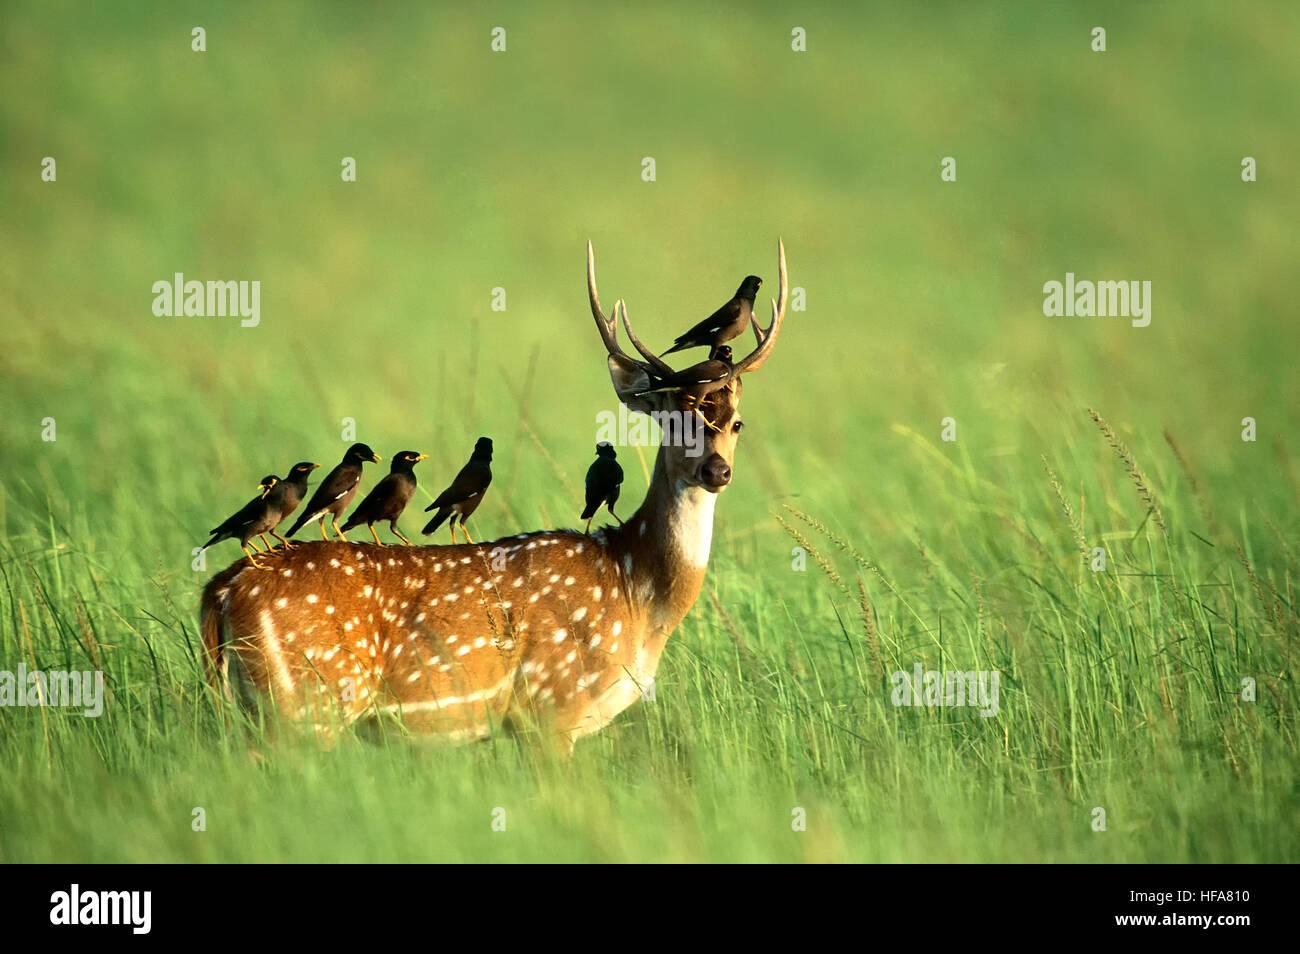 spotted-deer-axis-axisgrasslandherbivorecommon-mynacorbett-tiger-reservecorbett-HFA810.jpg